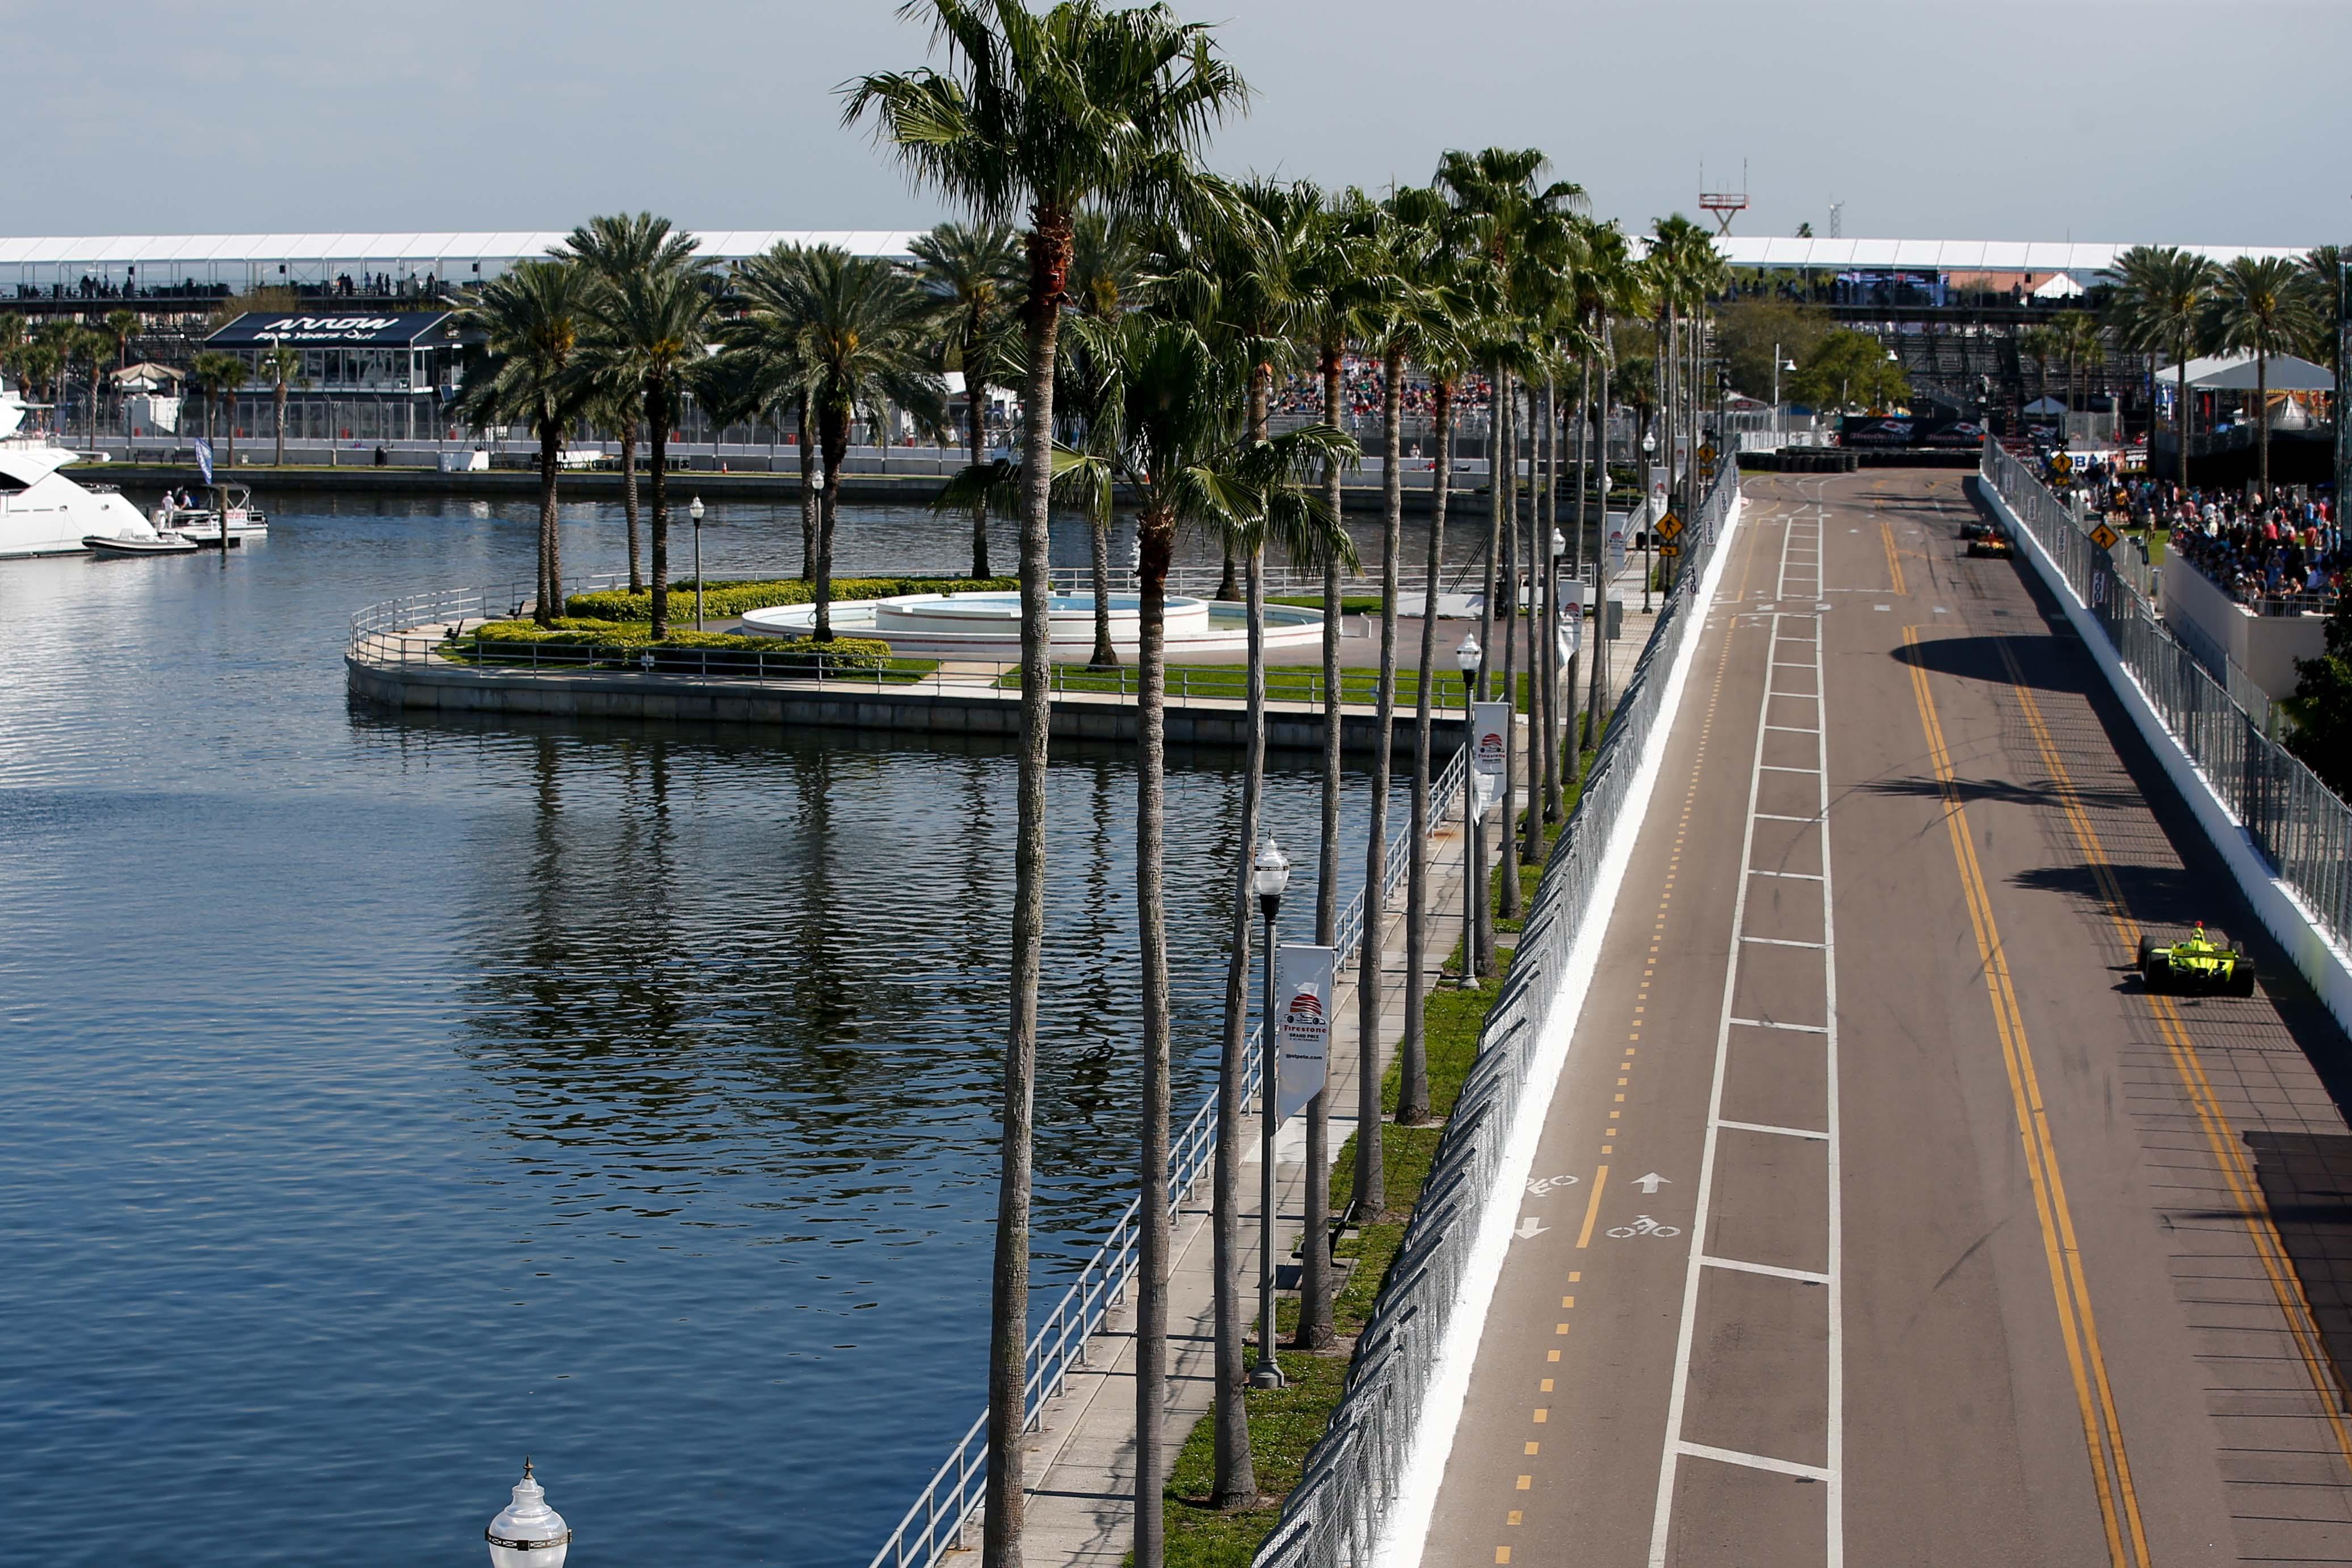 Grand Prix of St Petersburg Florida - Indycar Series